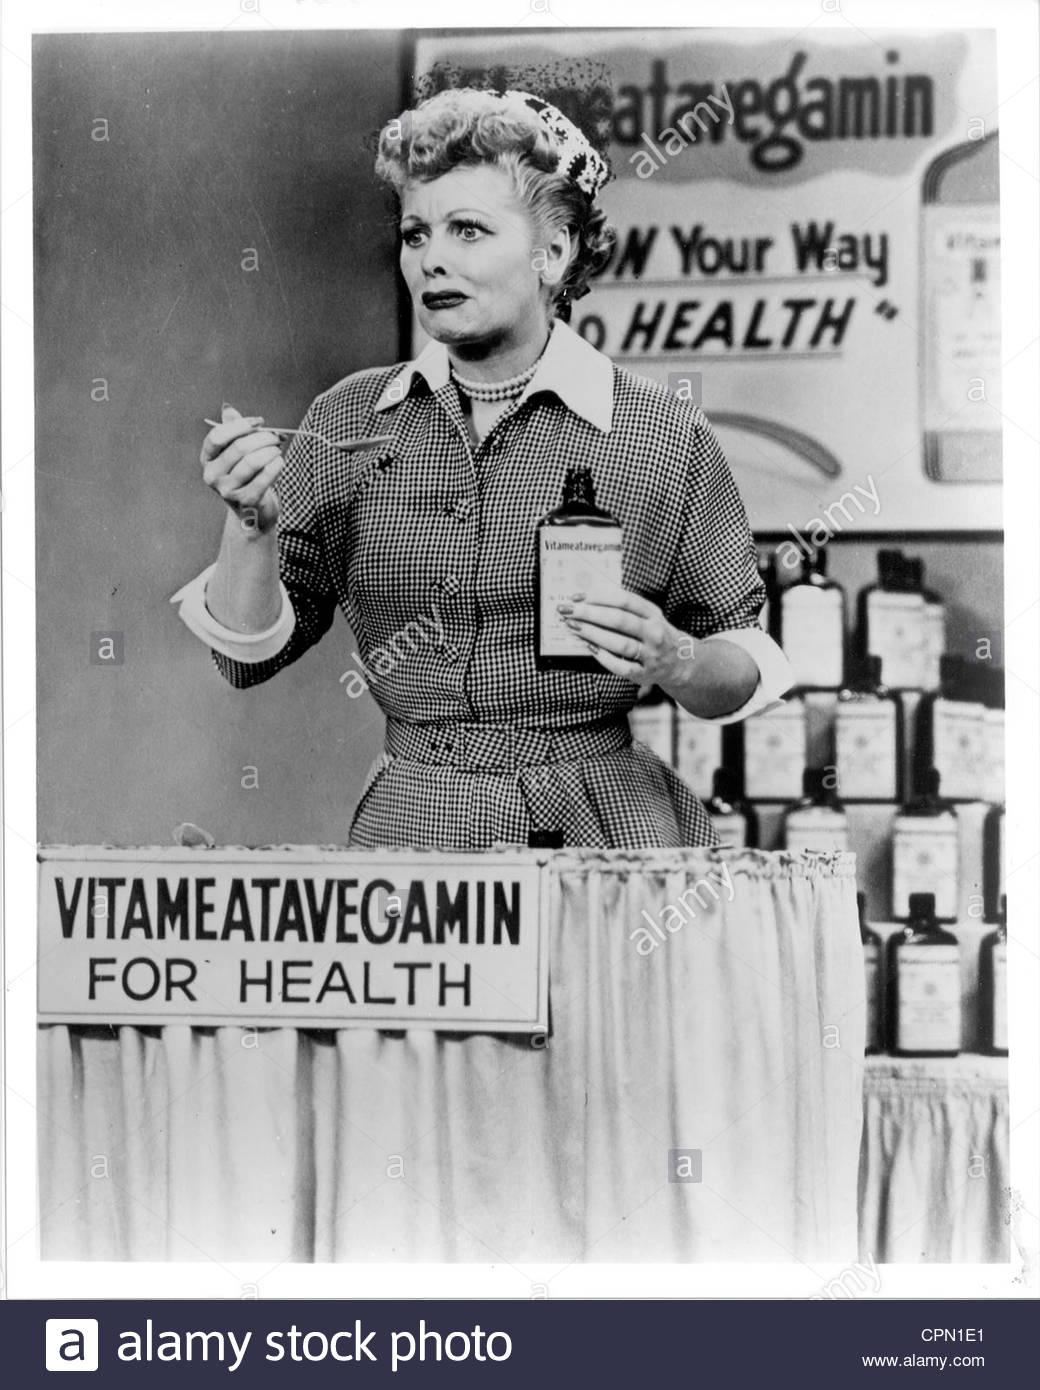 circa-1950s-lucille-ball-in-a-still-from-the-vita-meata-vegamin-episode-CPN1E1.jpg